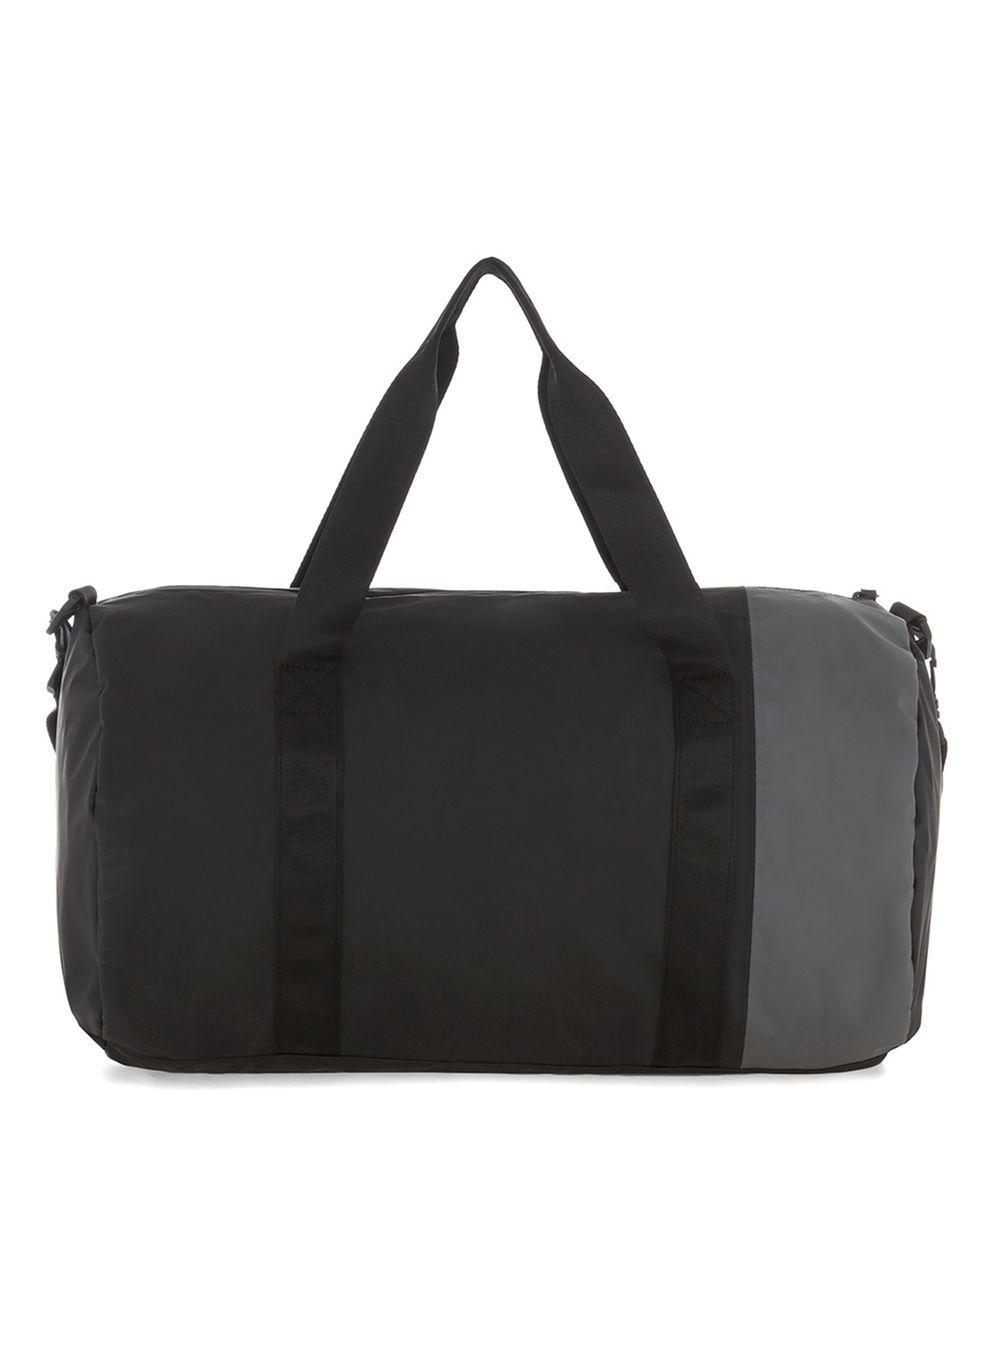 9783fa41cd Lyst - TOPMAN Black And Grey Gym Bag in Black for Men